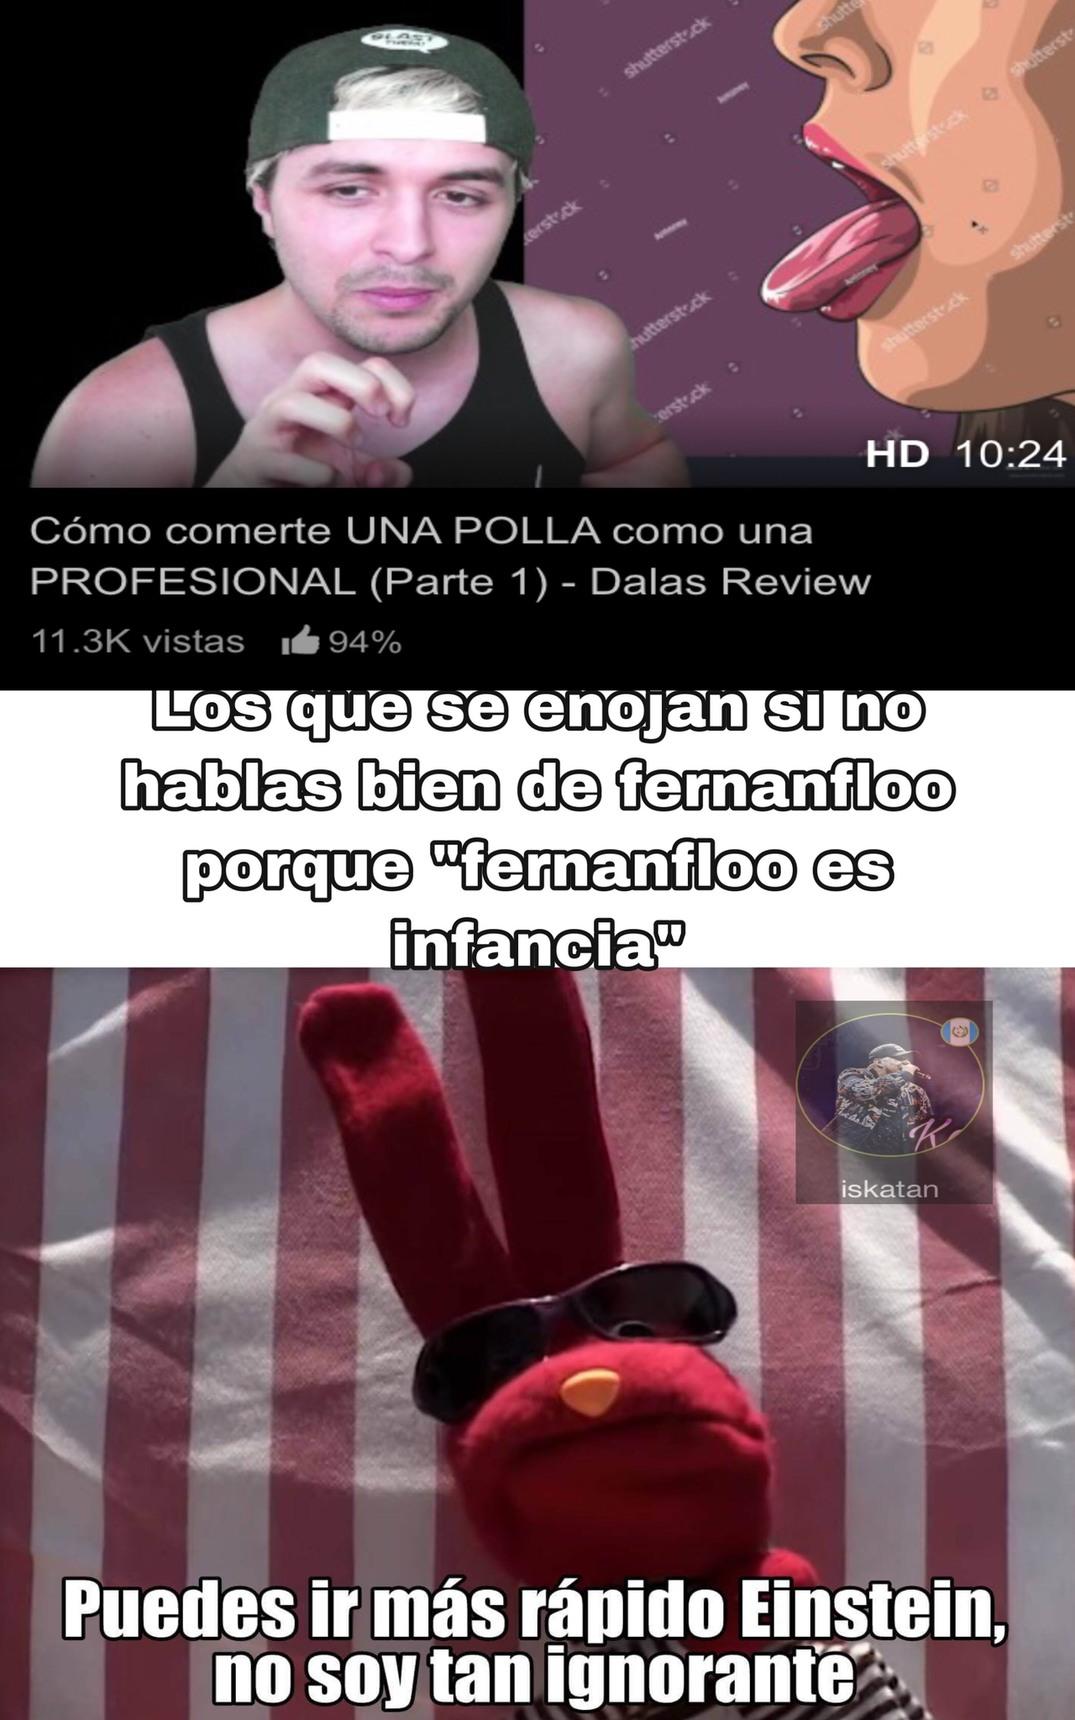 Banda,no me lo van a creer https://youtu.be/y18OV0uLwc4 - meme